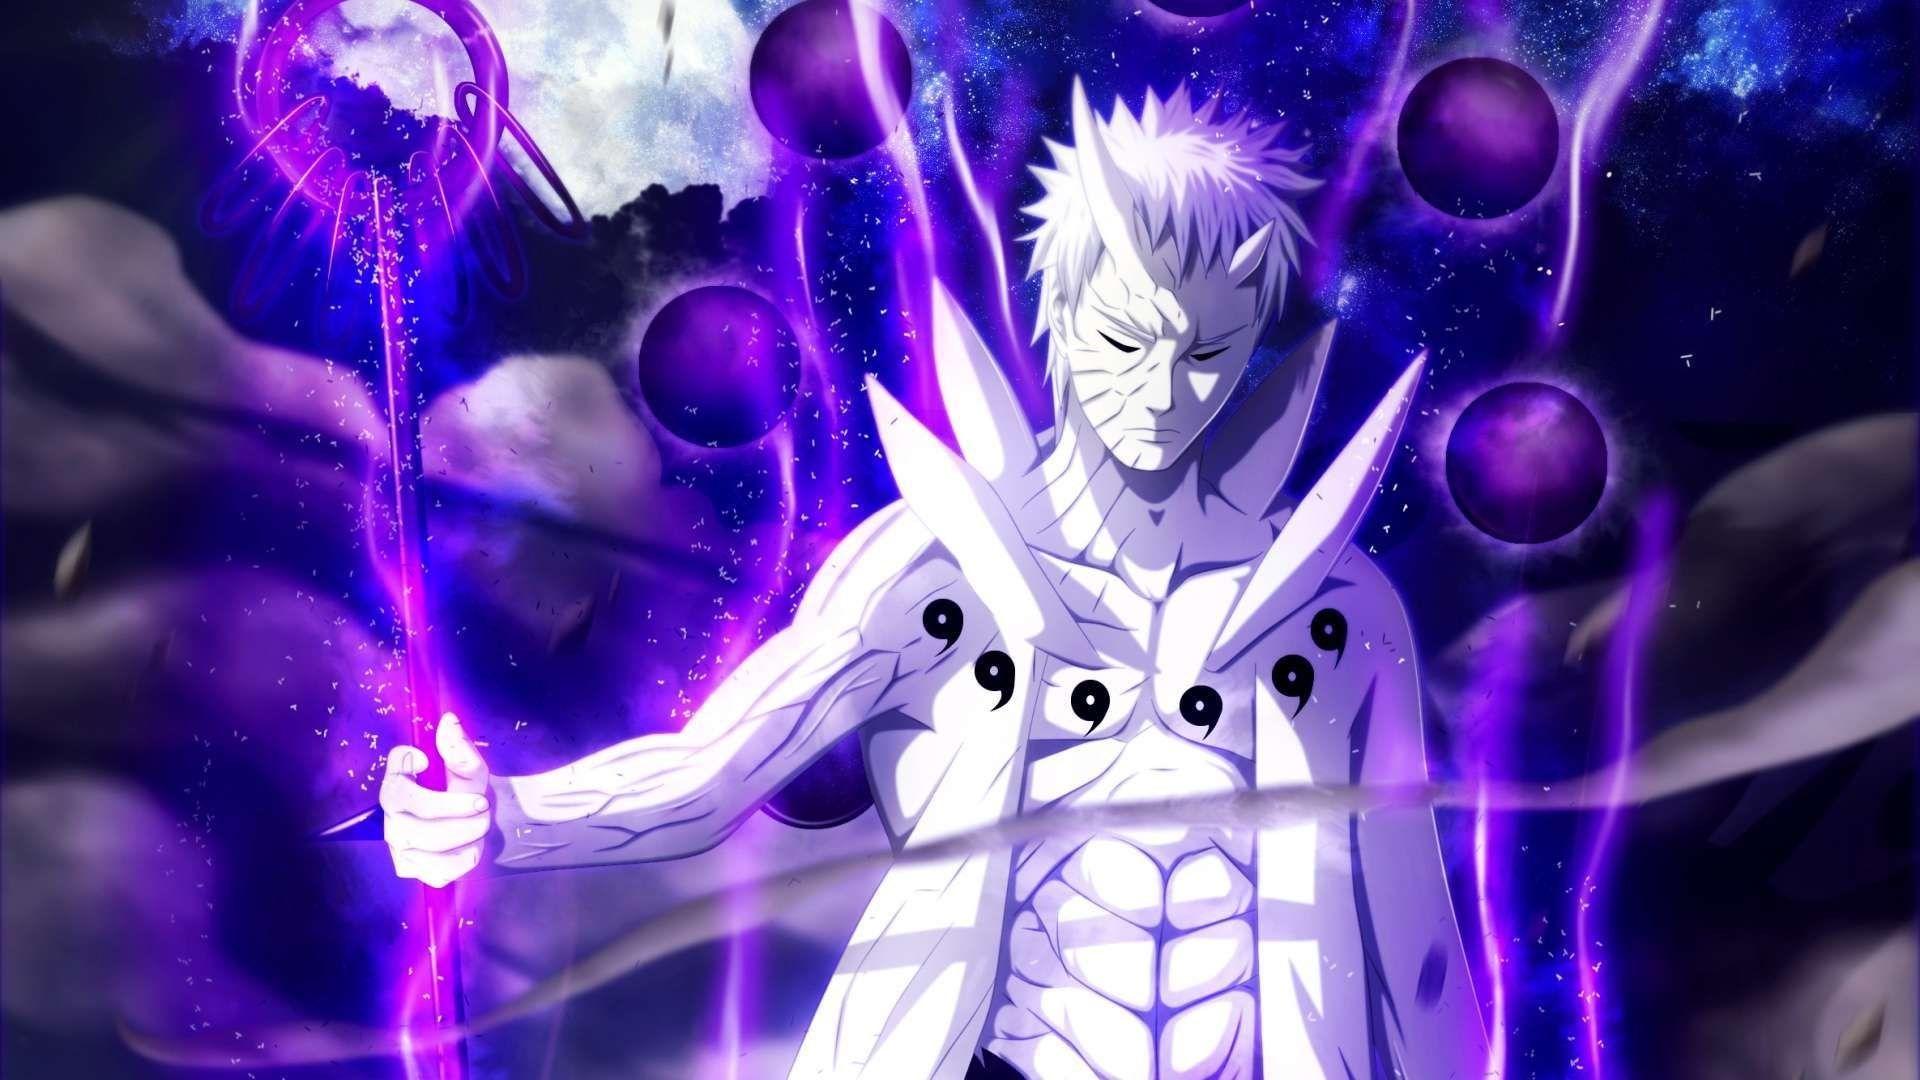 1080p Anime Wallpaper Free Download Anime Wallpaper Download 1080p Anime Wallpaper Wallpaper Naruto Shippuden